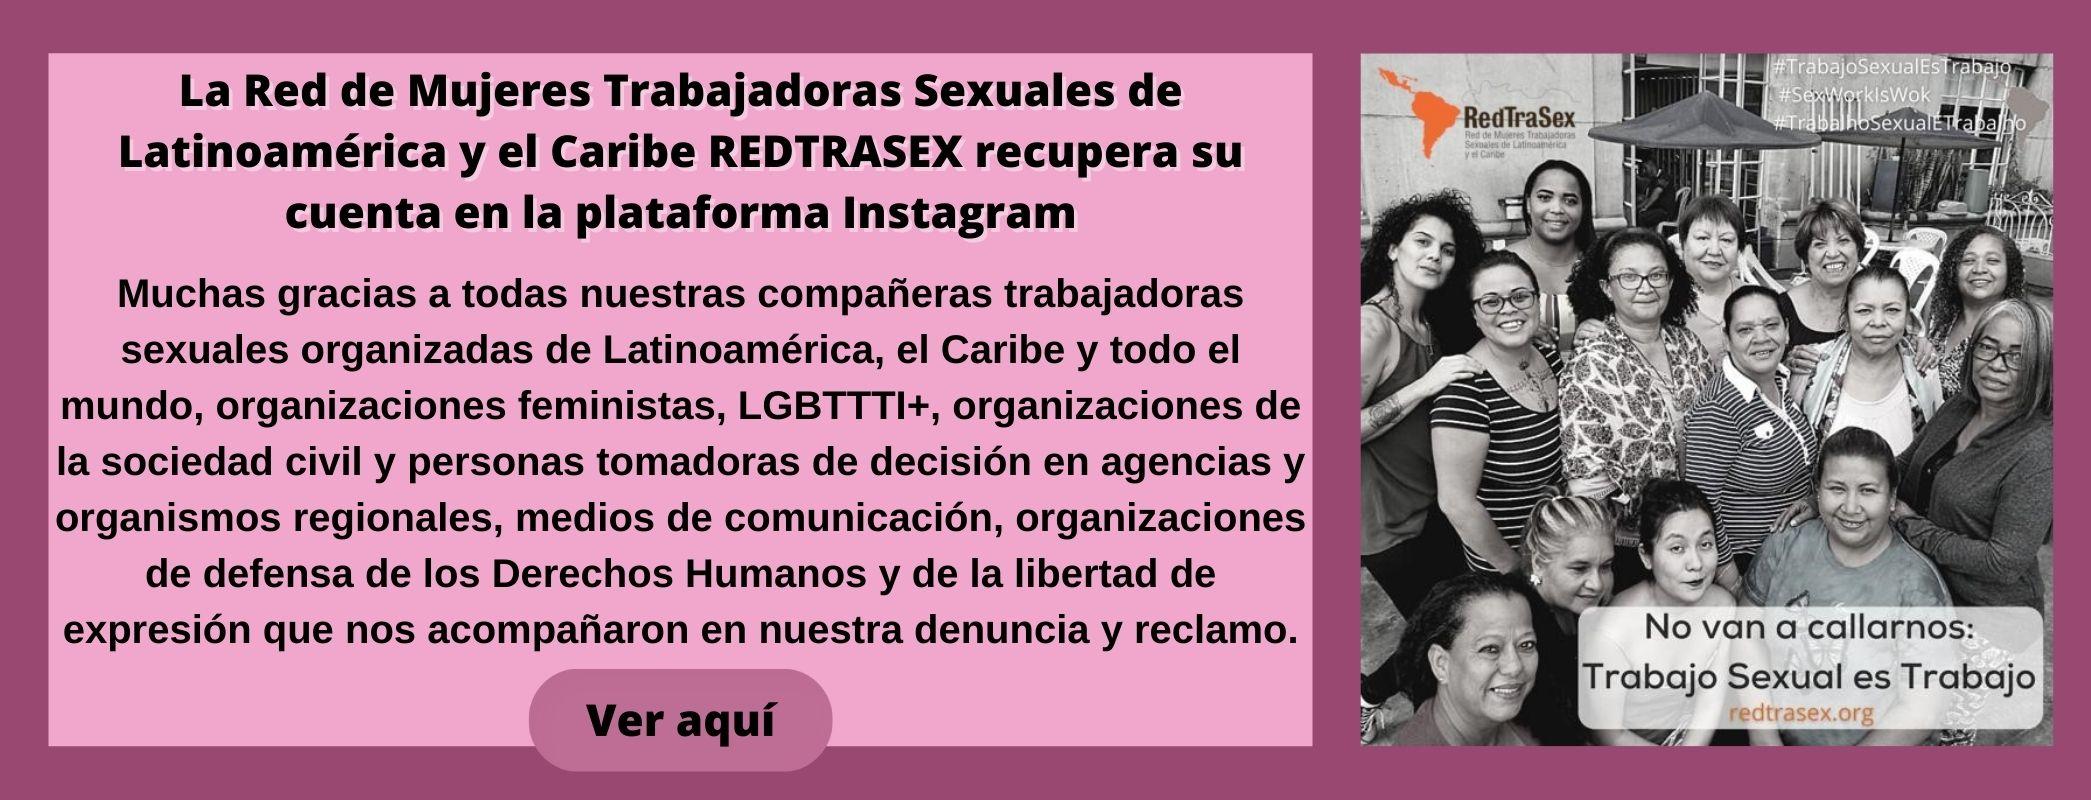 REDTRASEX